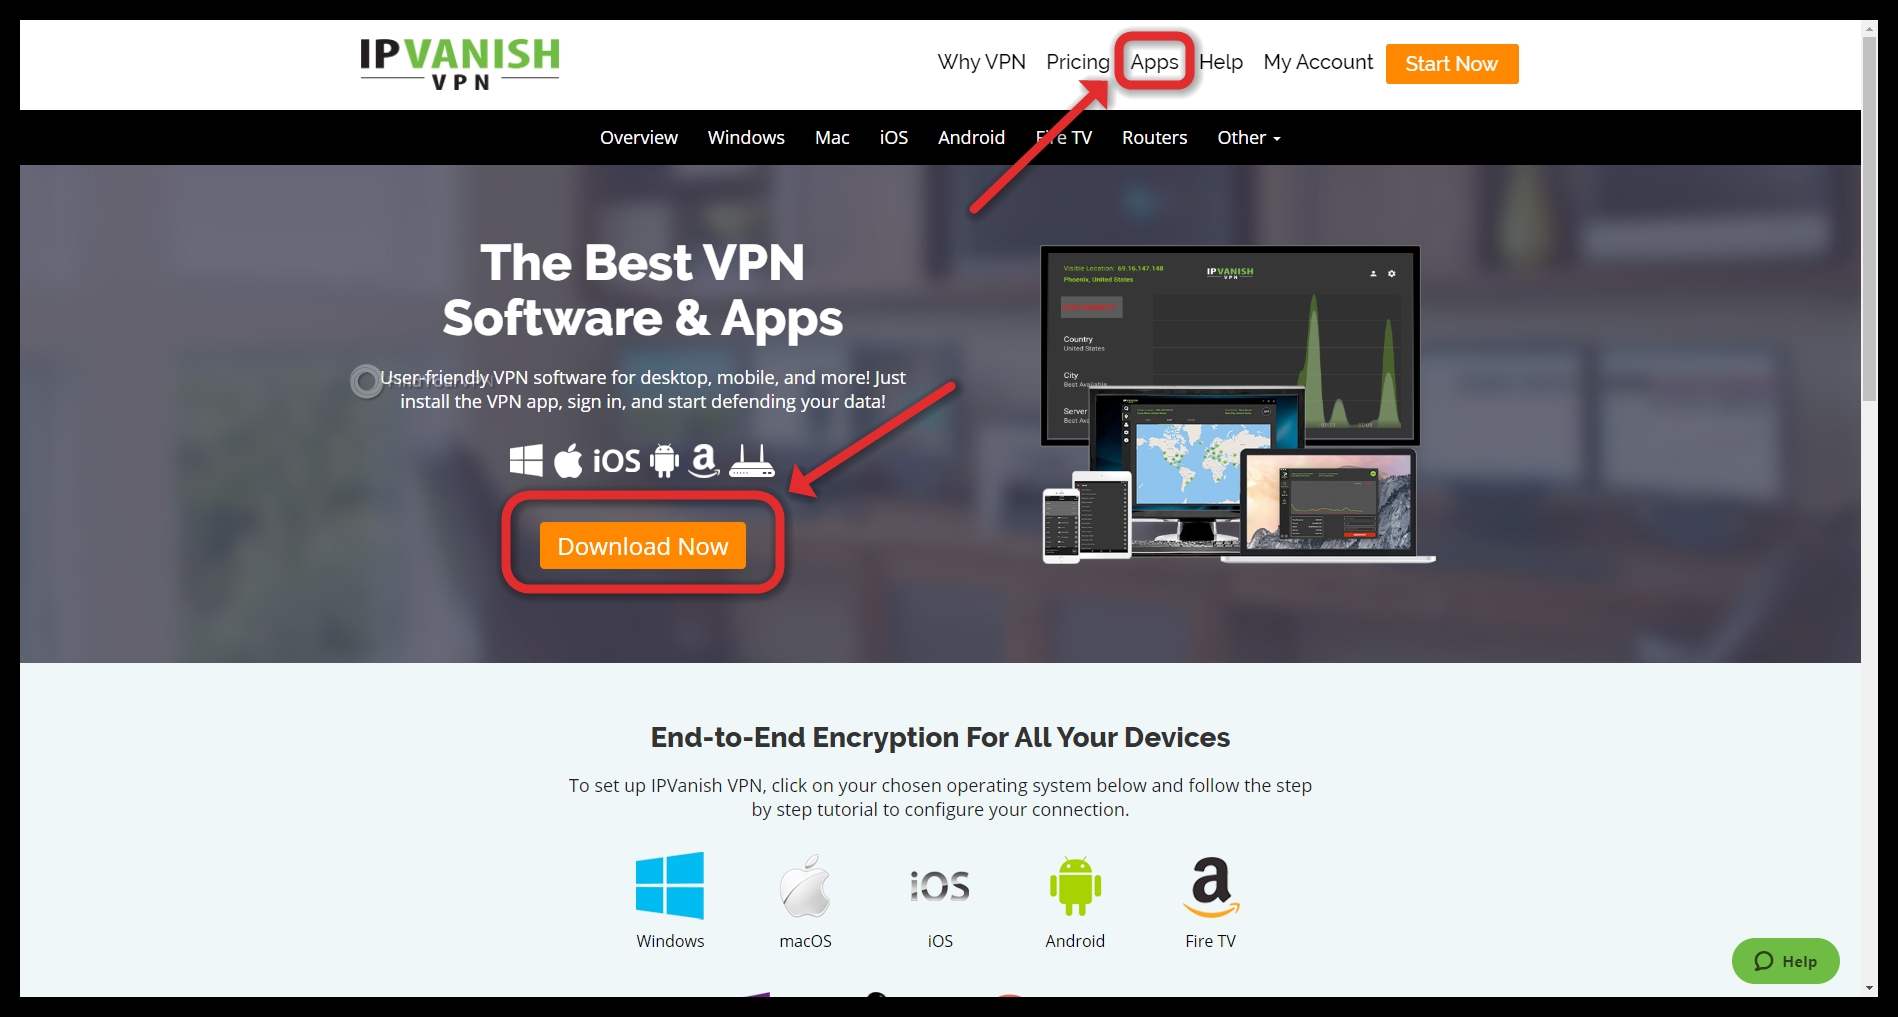 How to download IPVanish